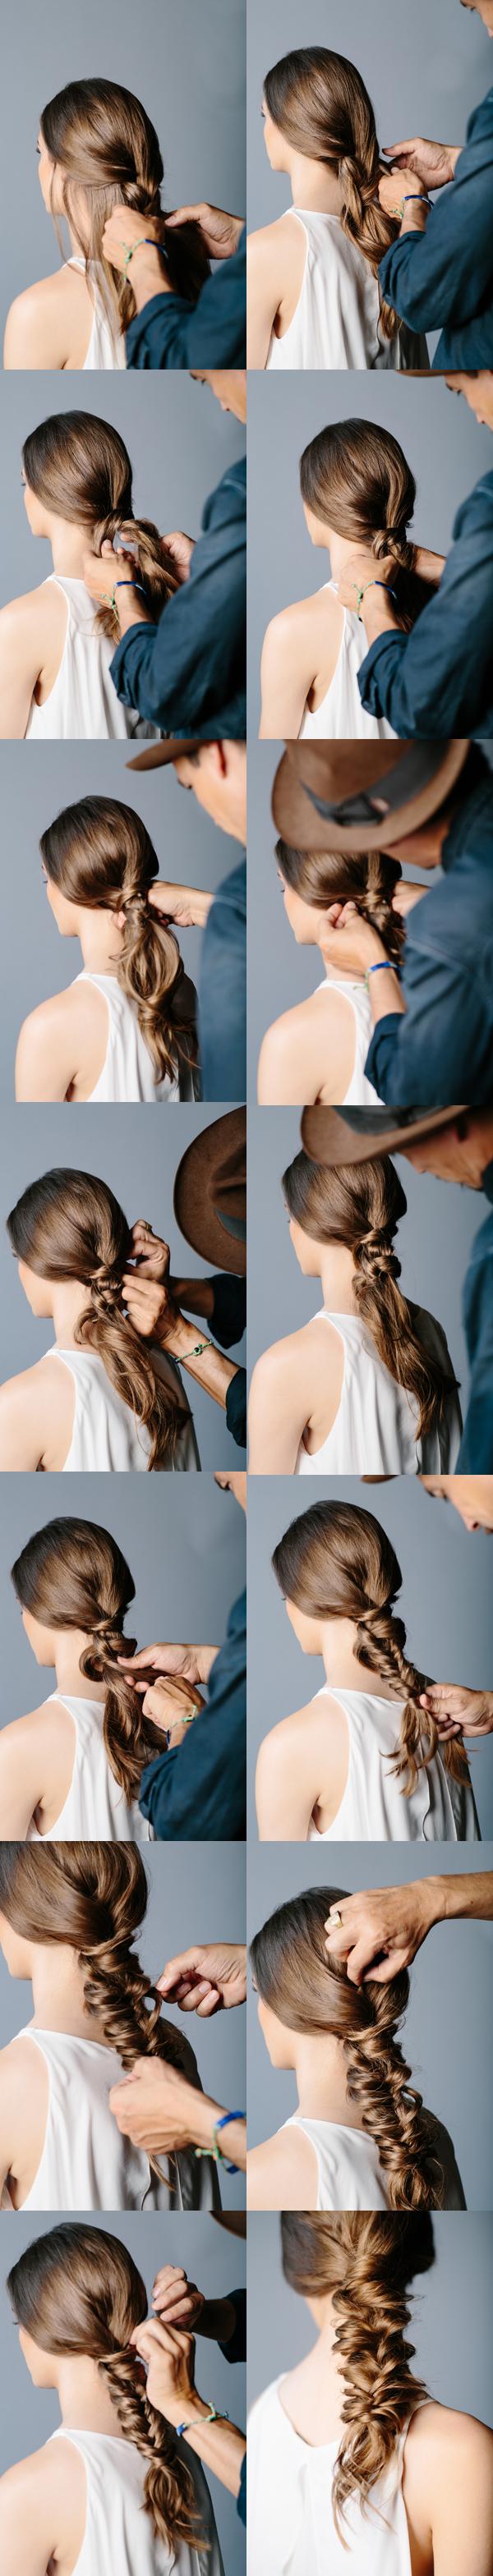 diy-tutorial-fishtail-braid